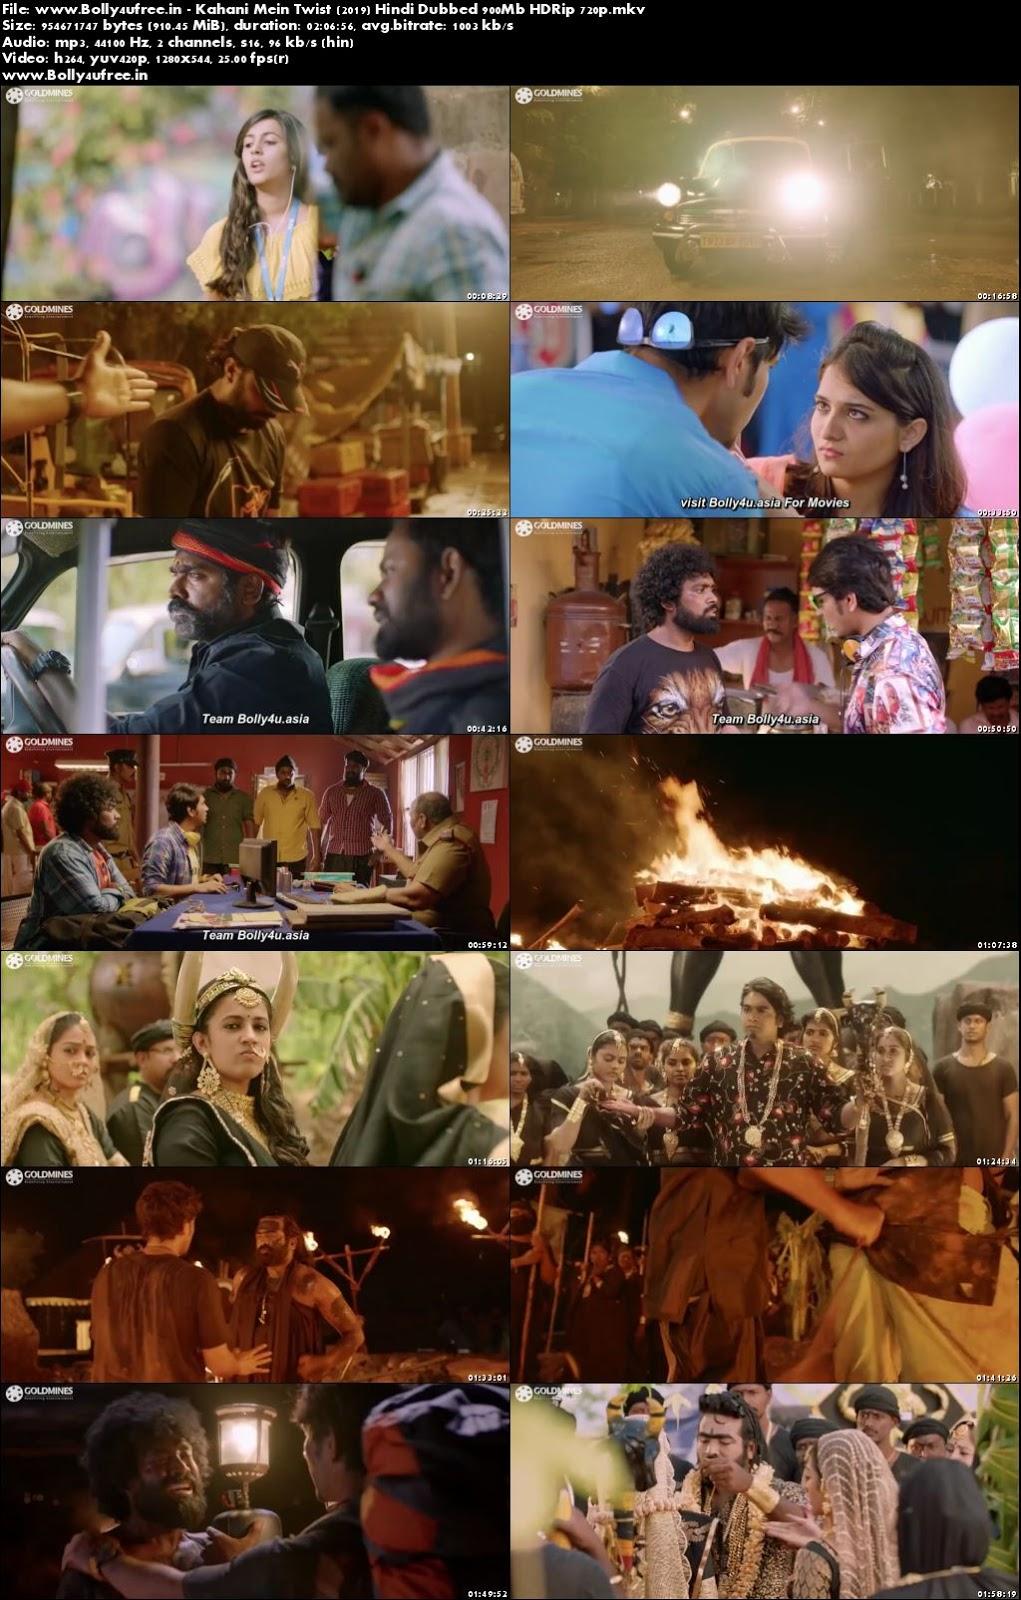 Kahani Mein Twist 2019 Hindi Dubbed 300Mb HDRip 480p